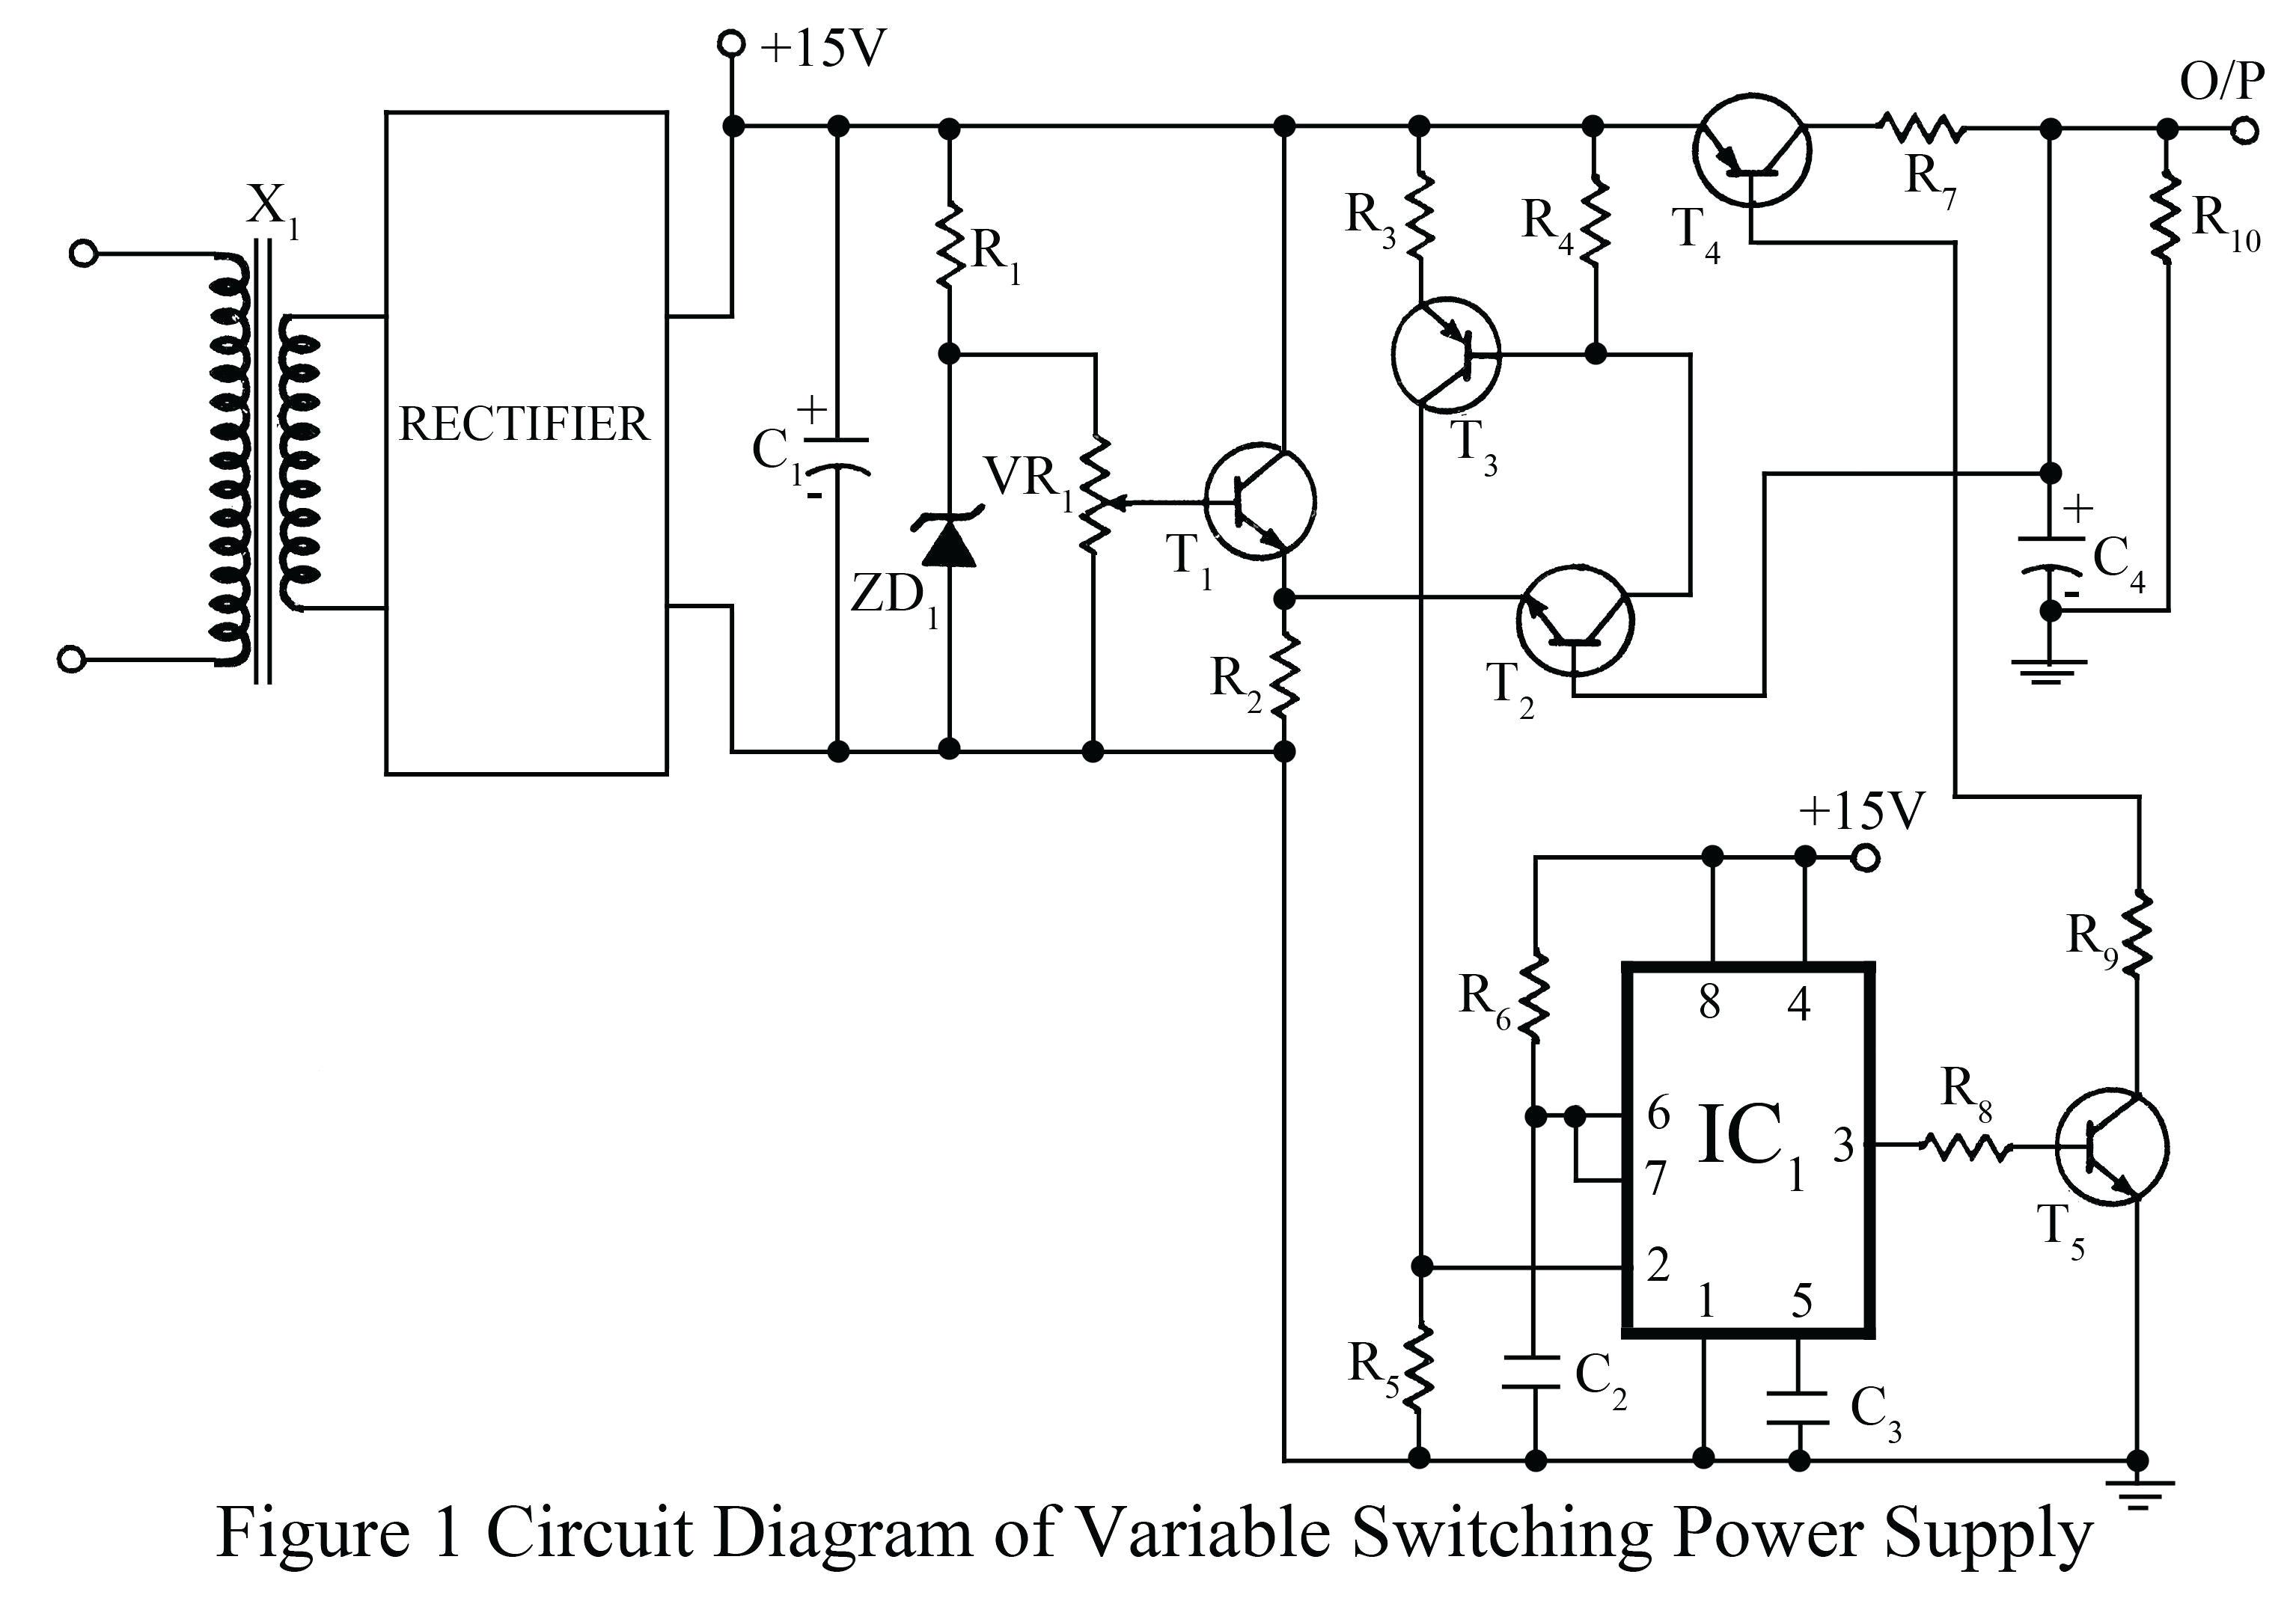 xbox 360 slim wiring diagram wiring diagram name wiring diagram xbox 360 source